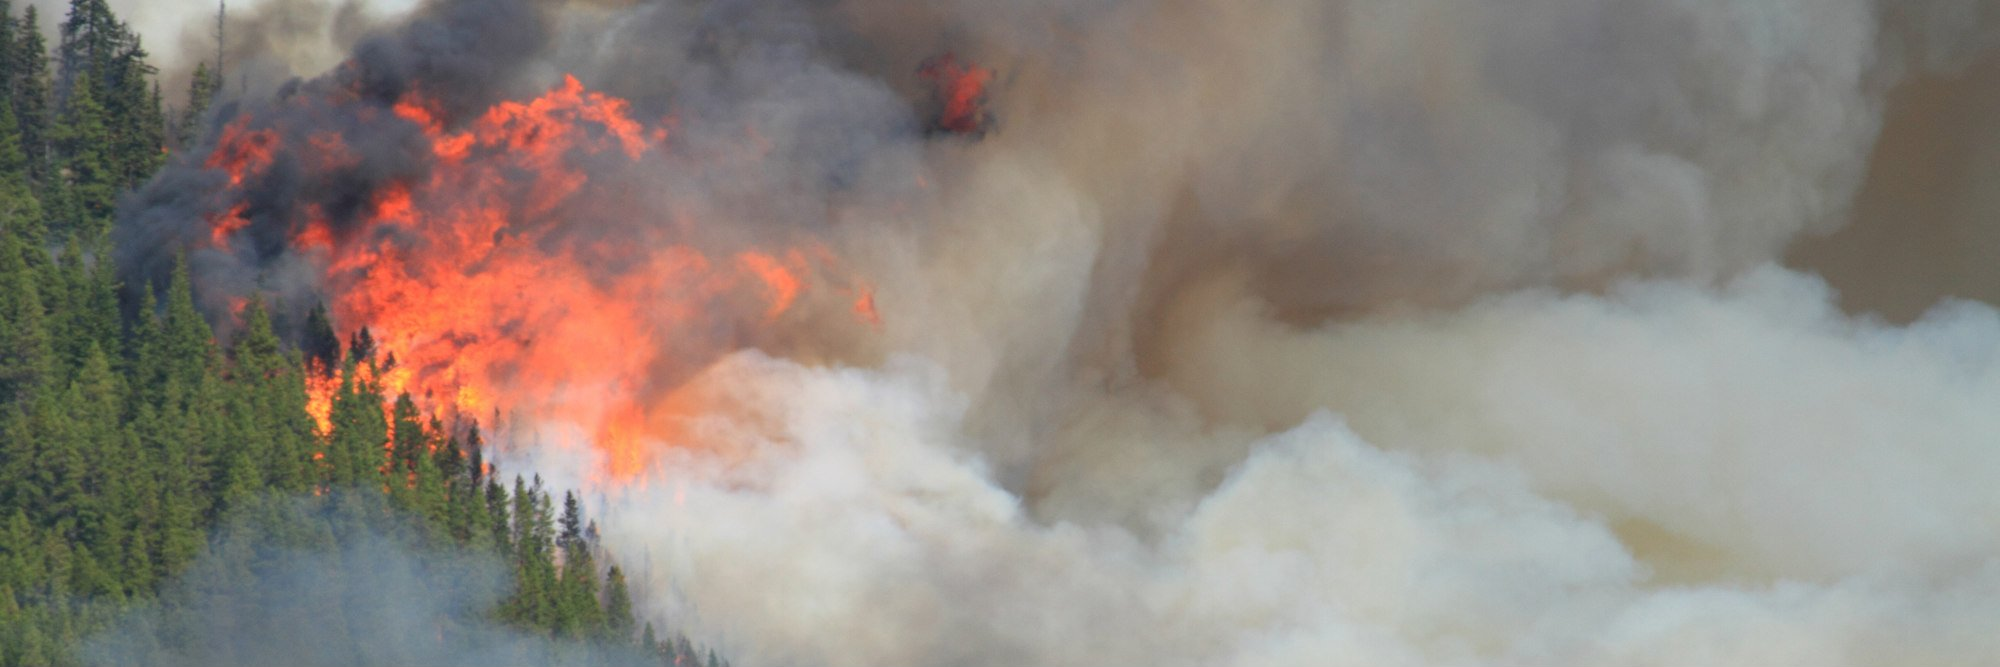 huge flames burning trees